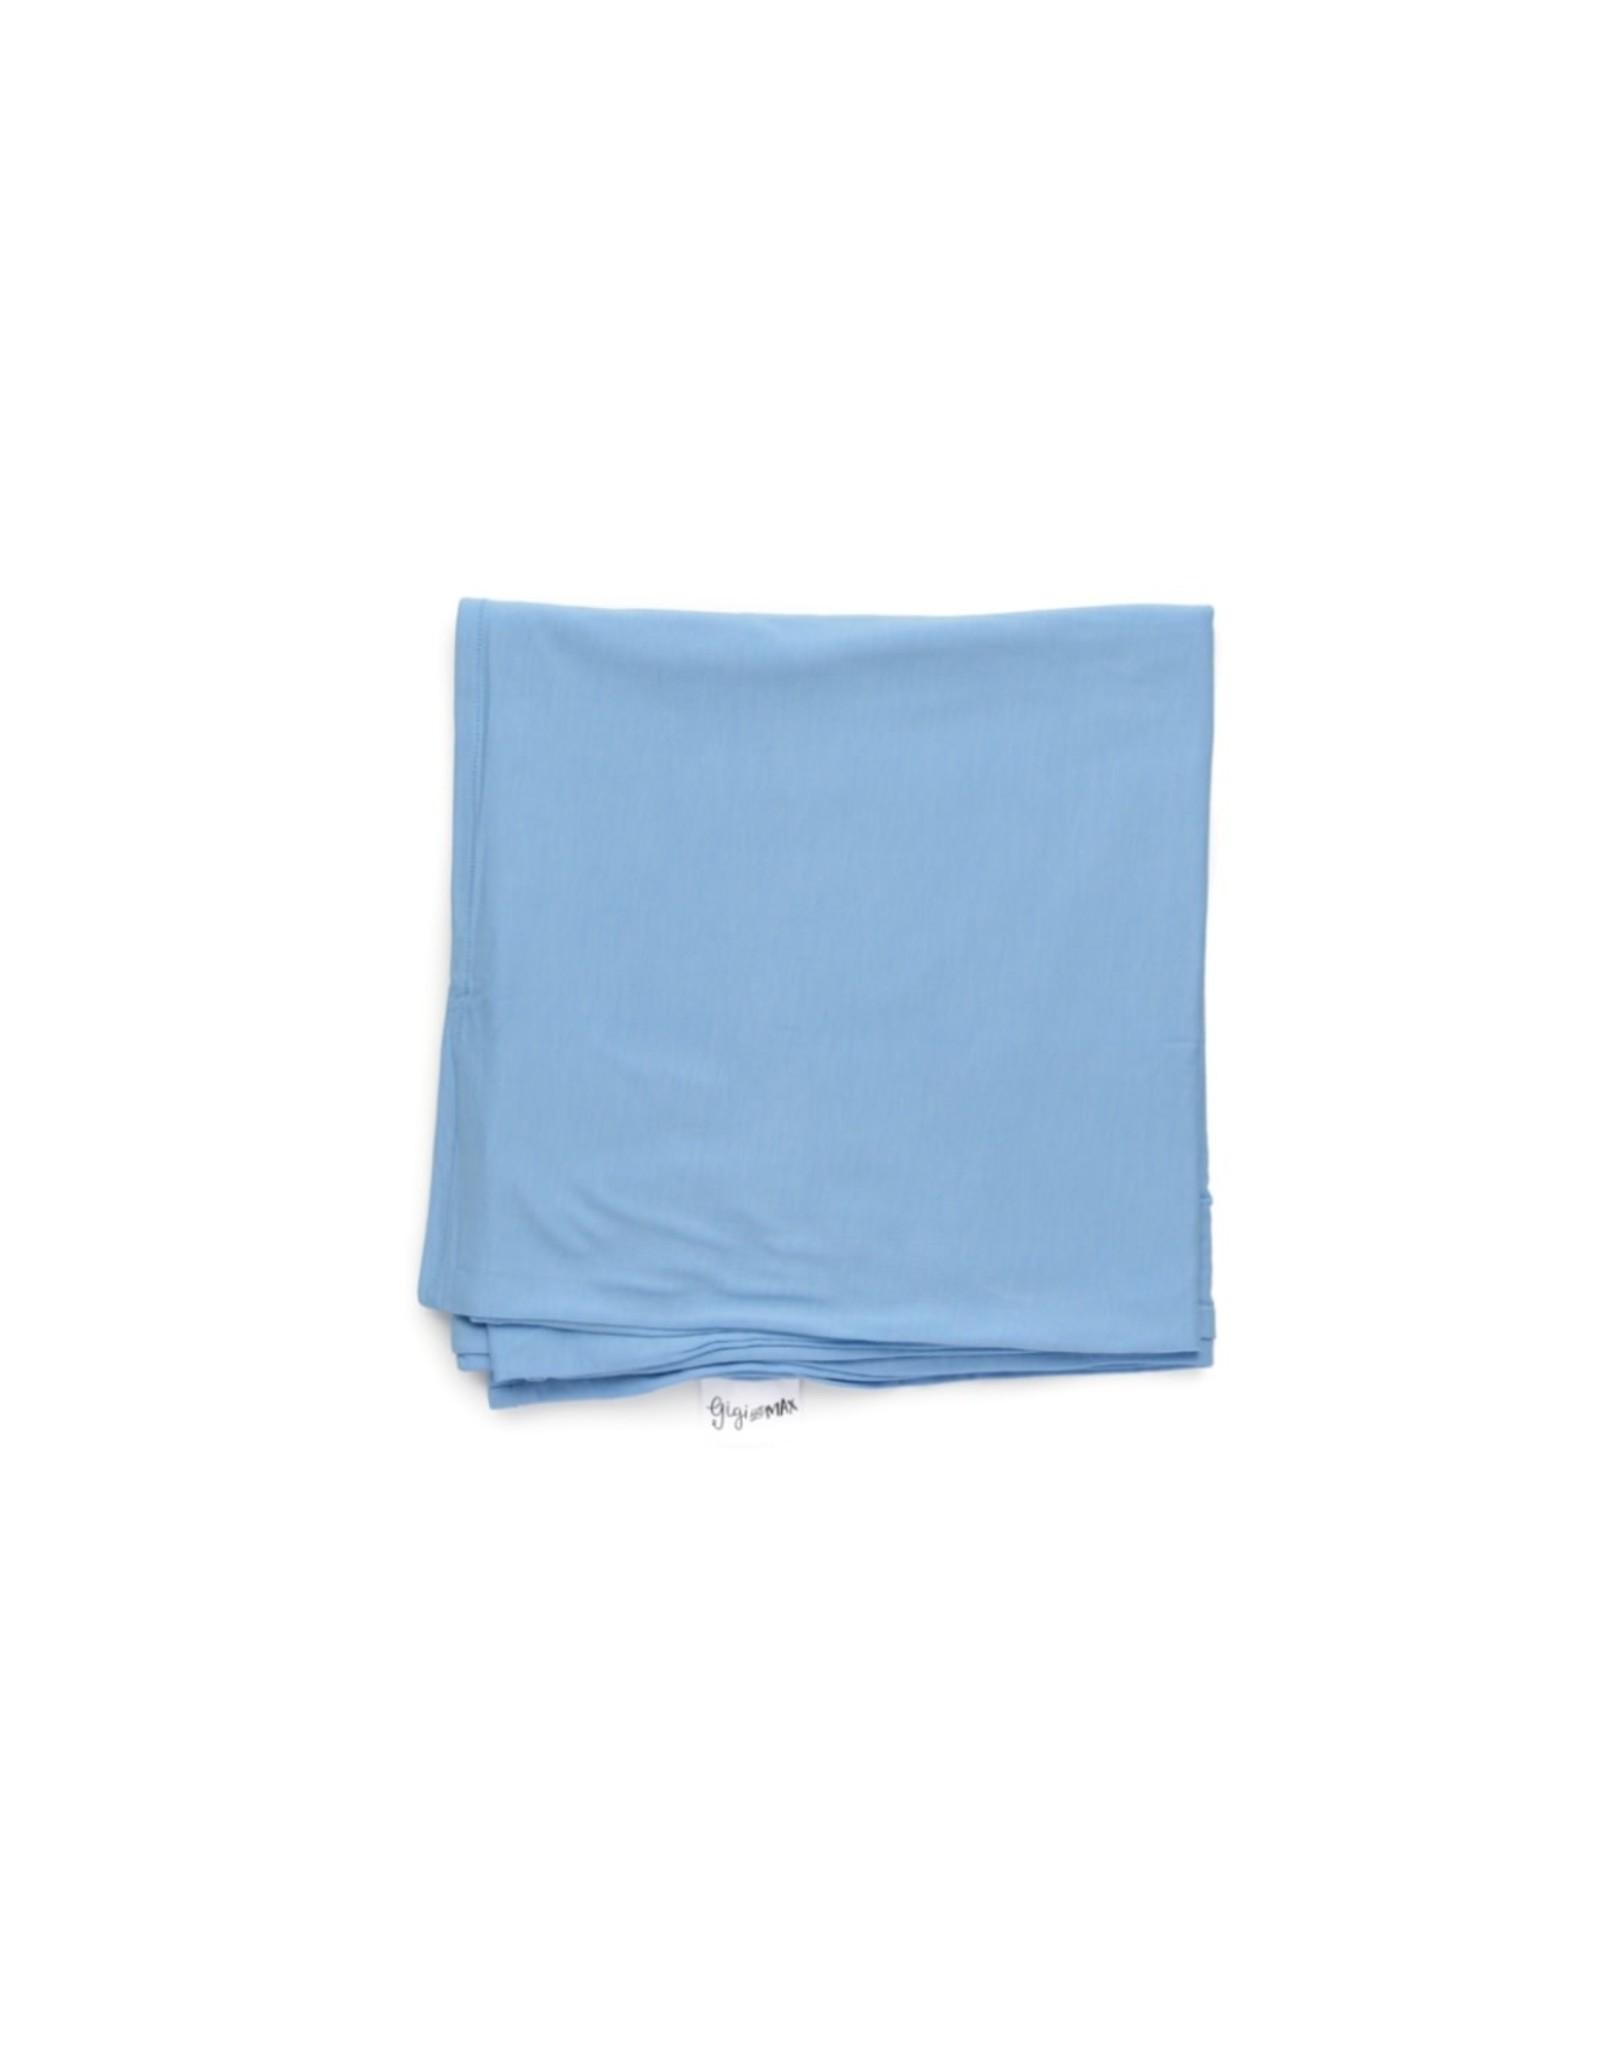 Gigi & Max Gigi & Max - Baby Blue Swaddle Blanket